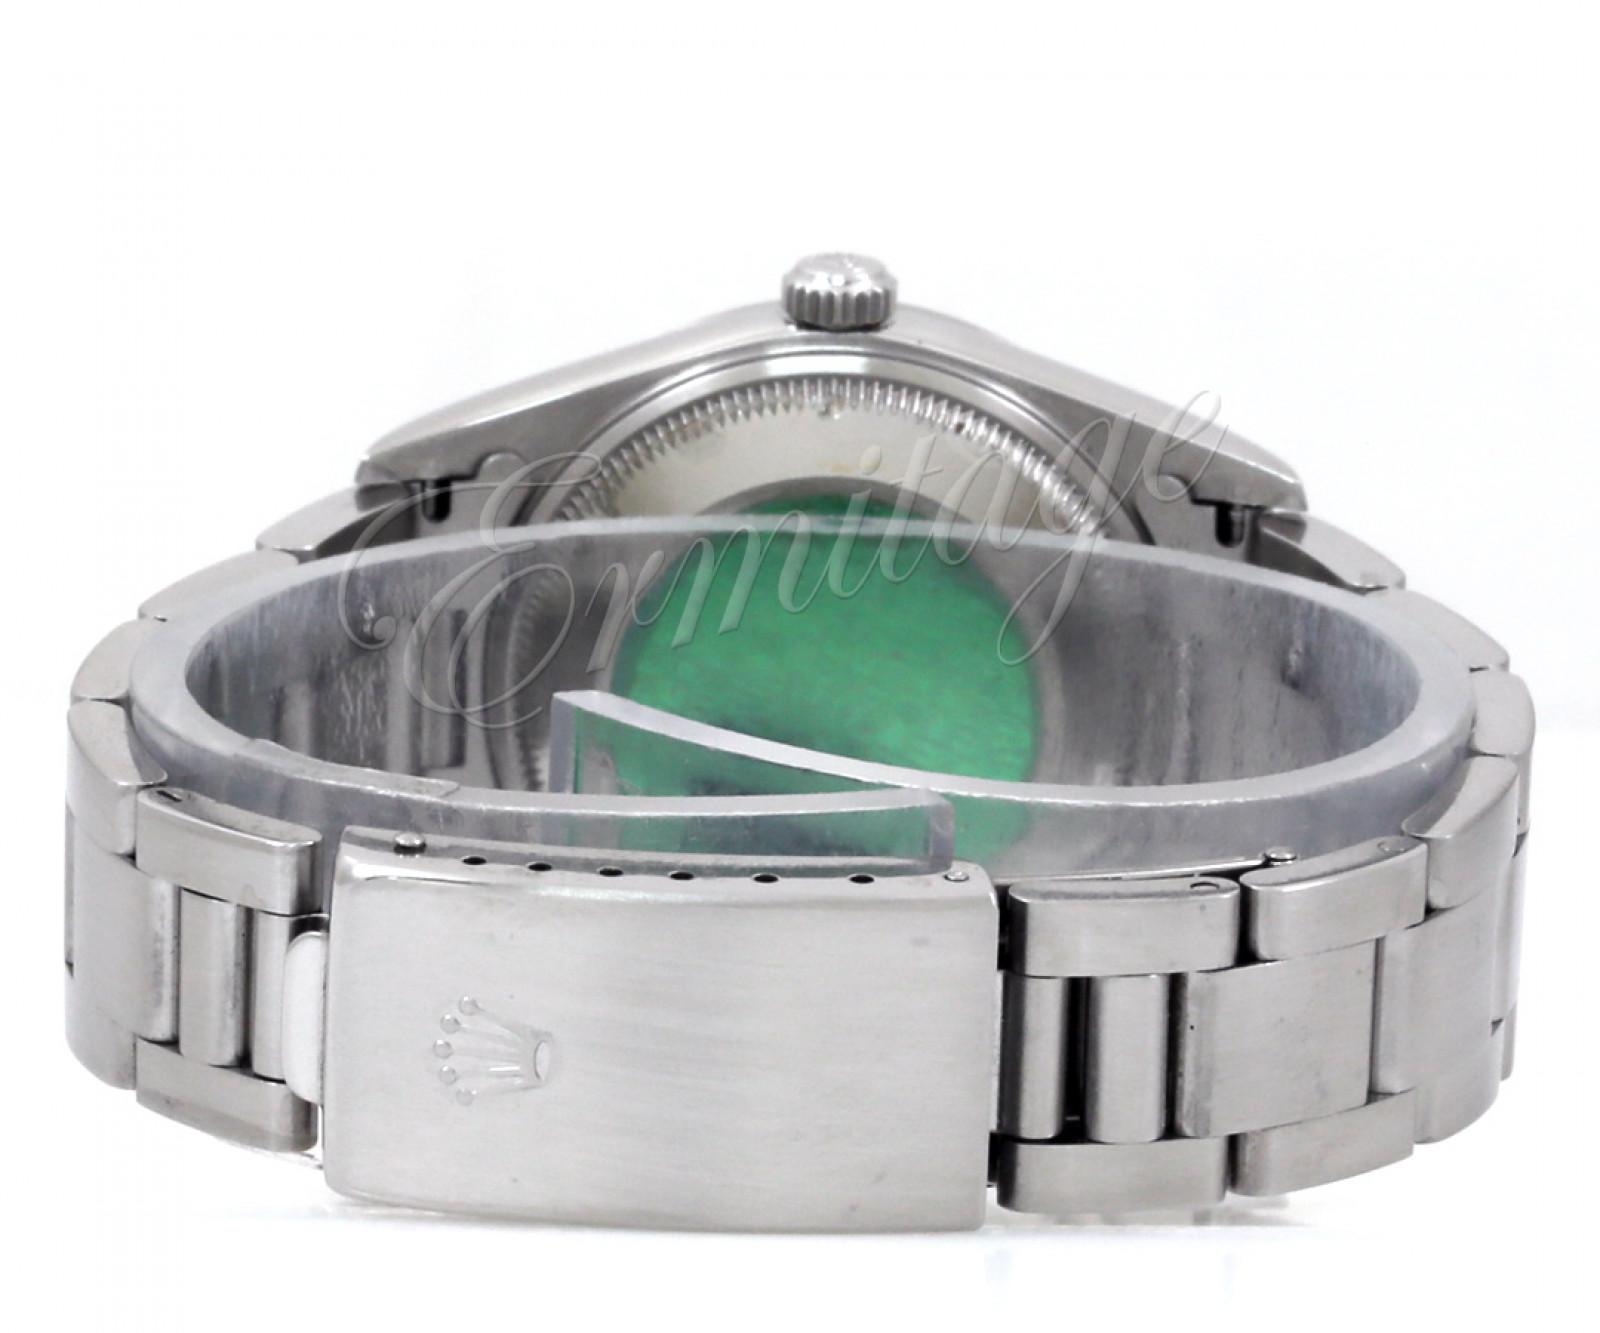 New Rolex Oyster Perpetual Date 15200 Unworn